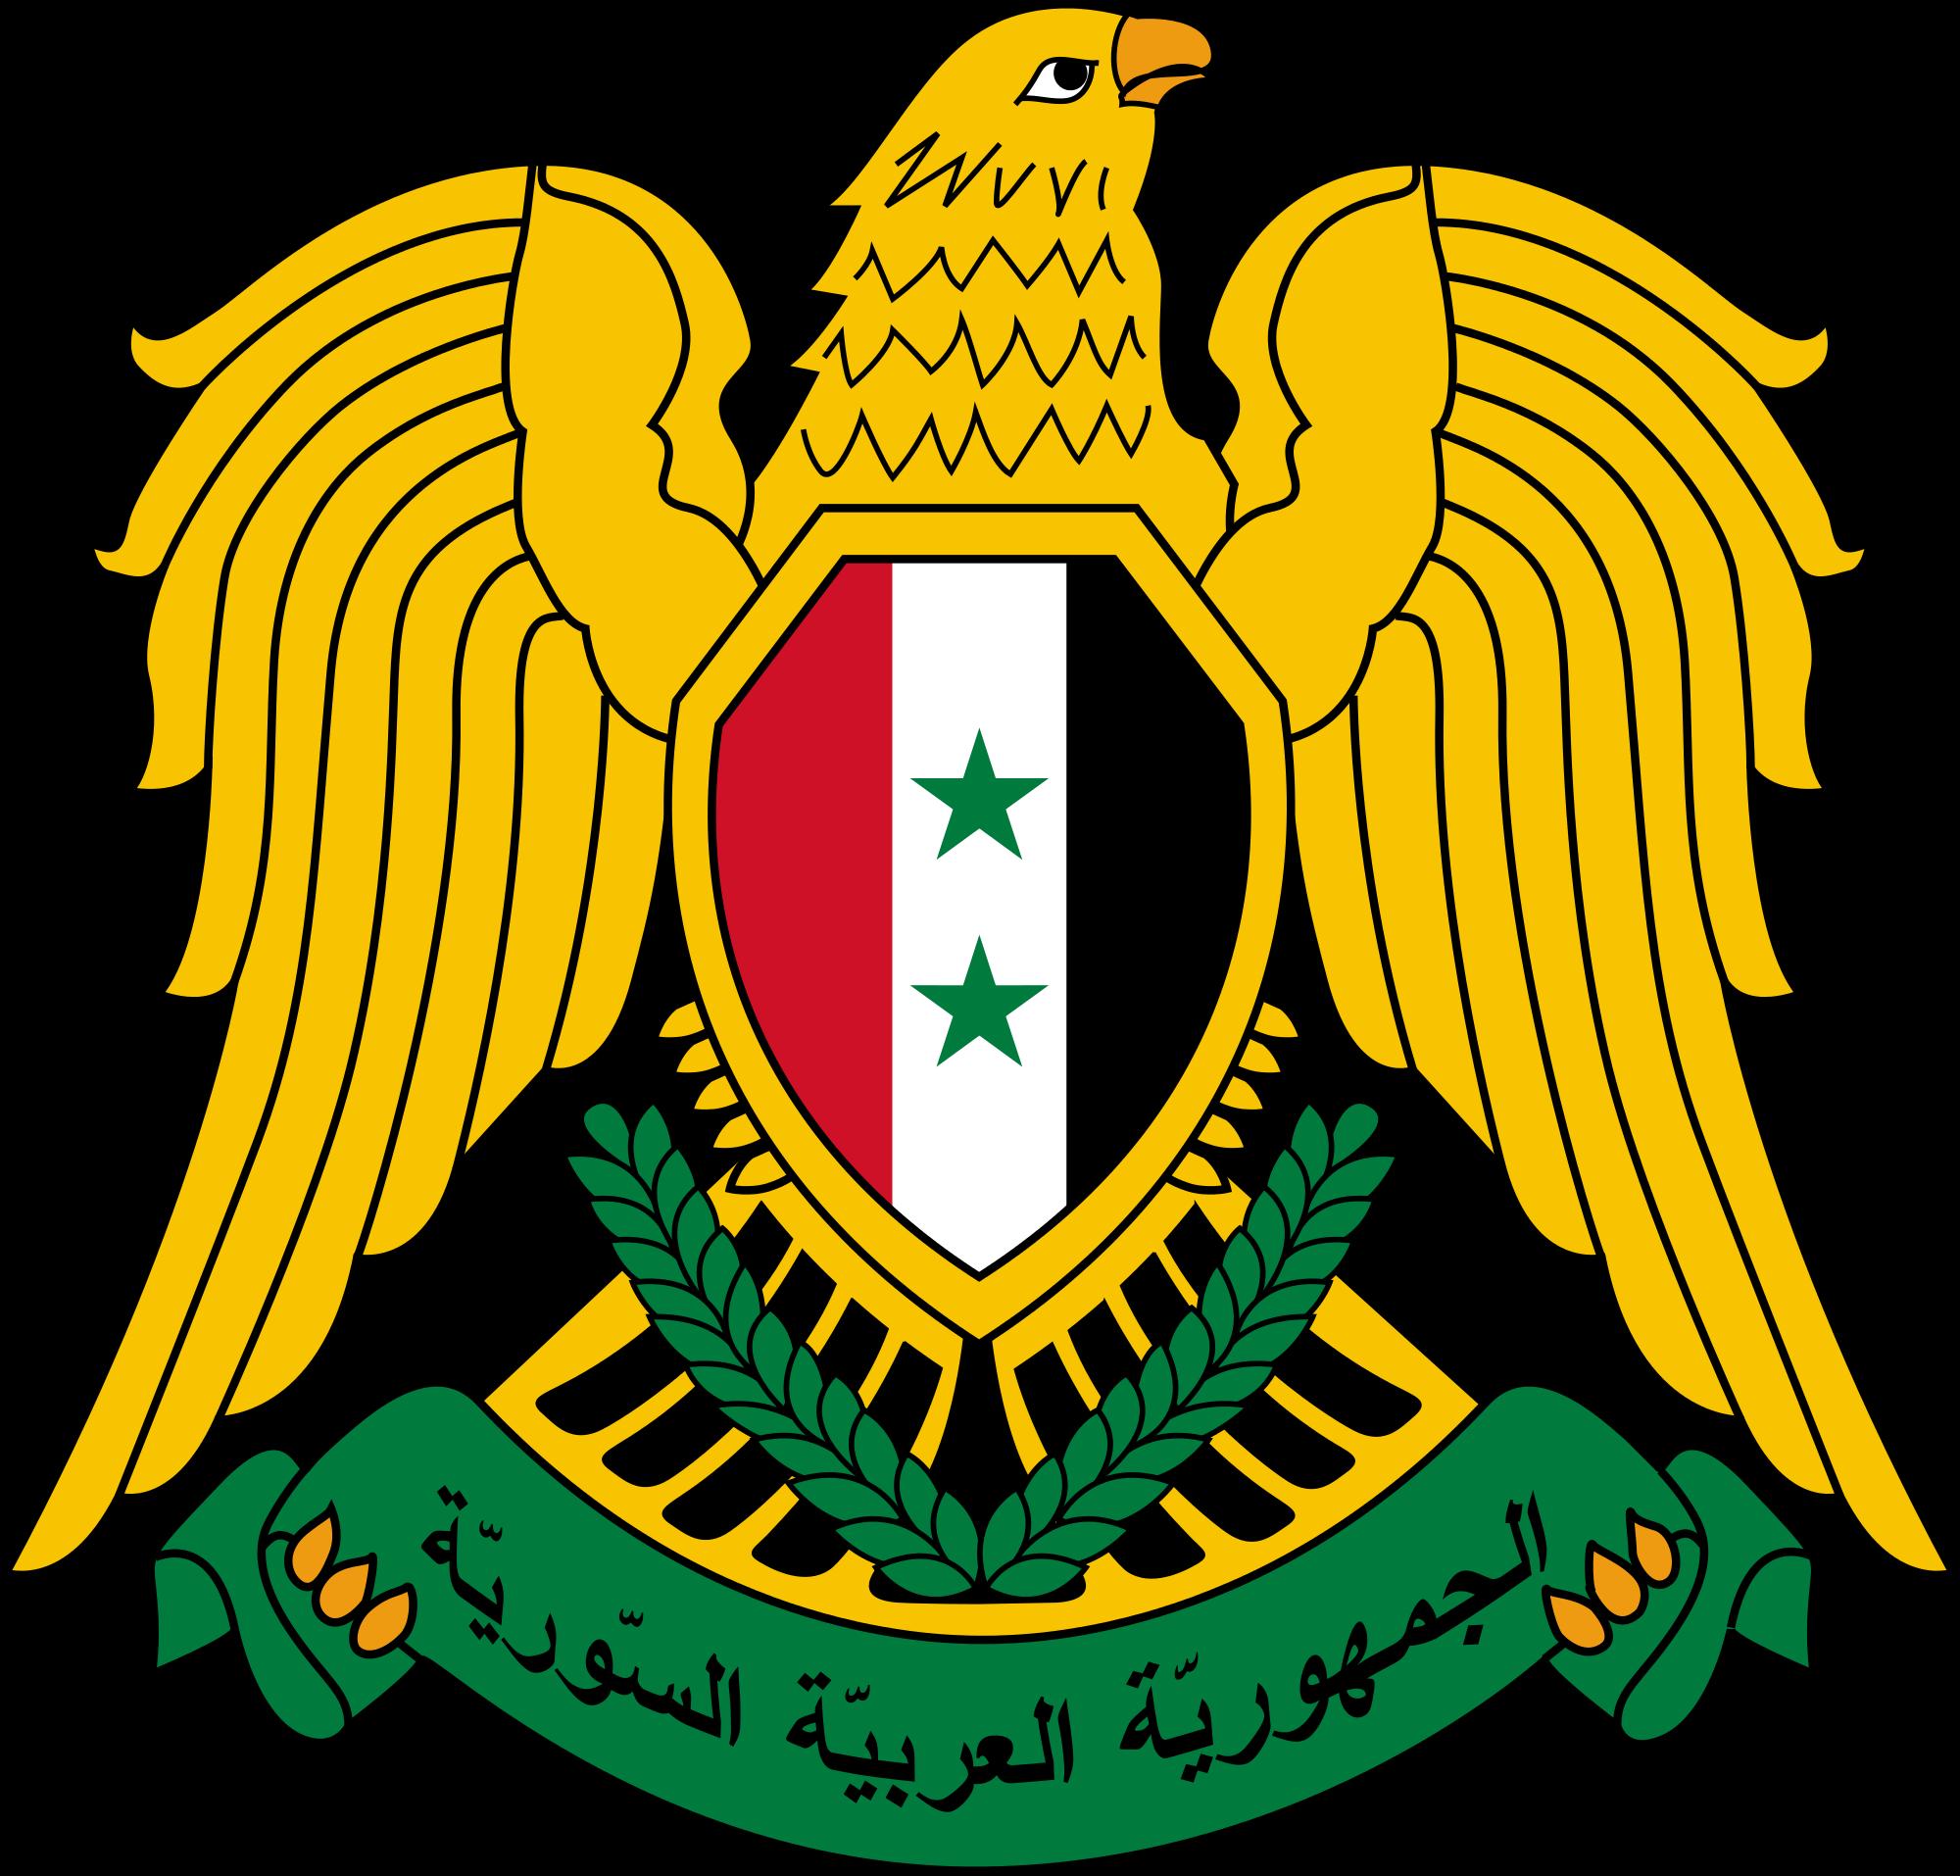 Wapenschild van Syrië